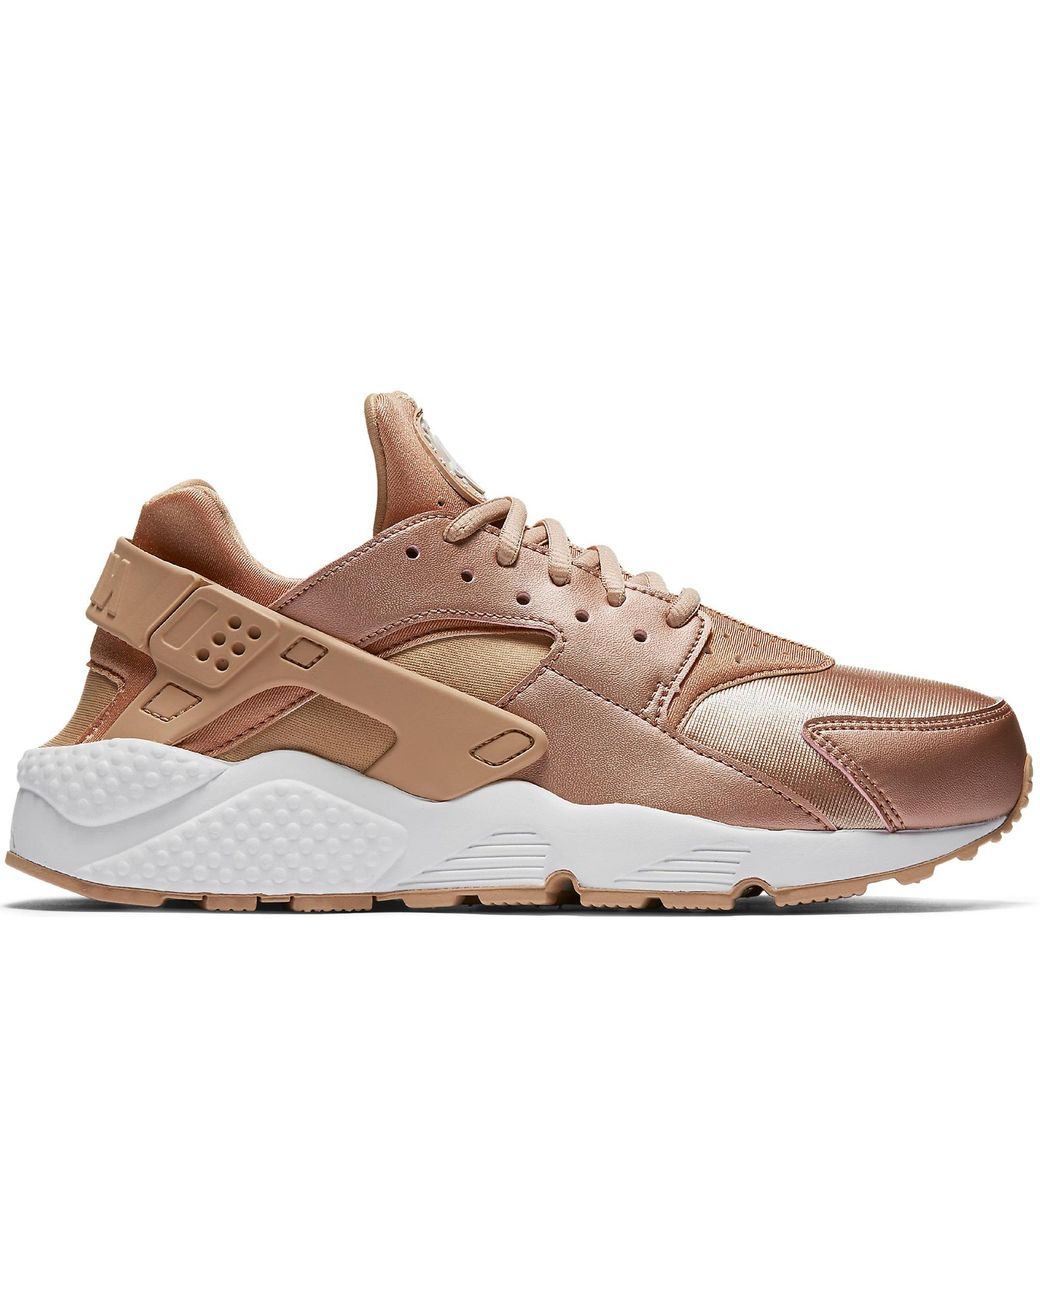 Nike Air Huarache Run Rose Gold (w) in